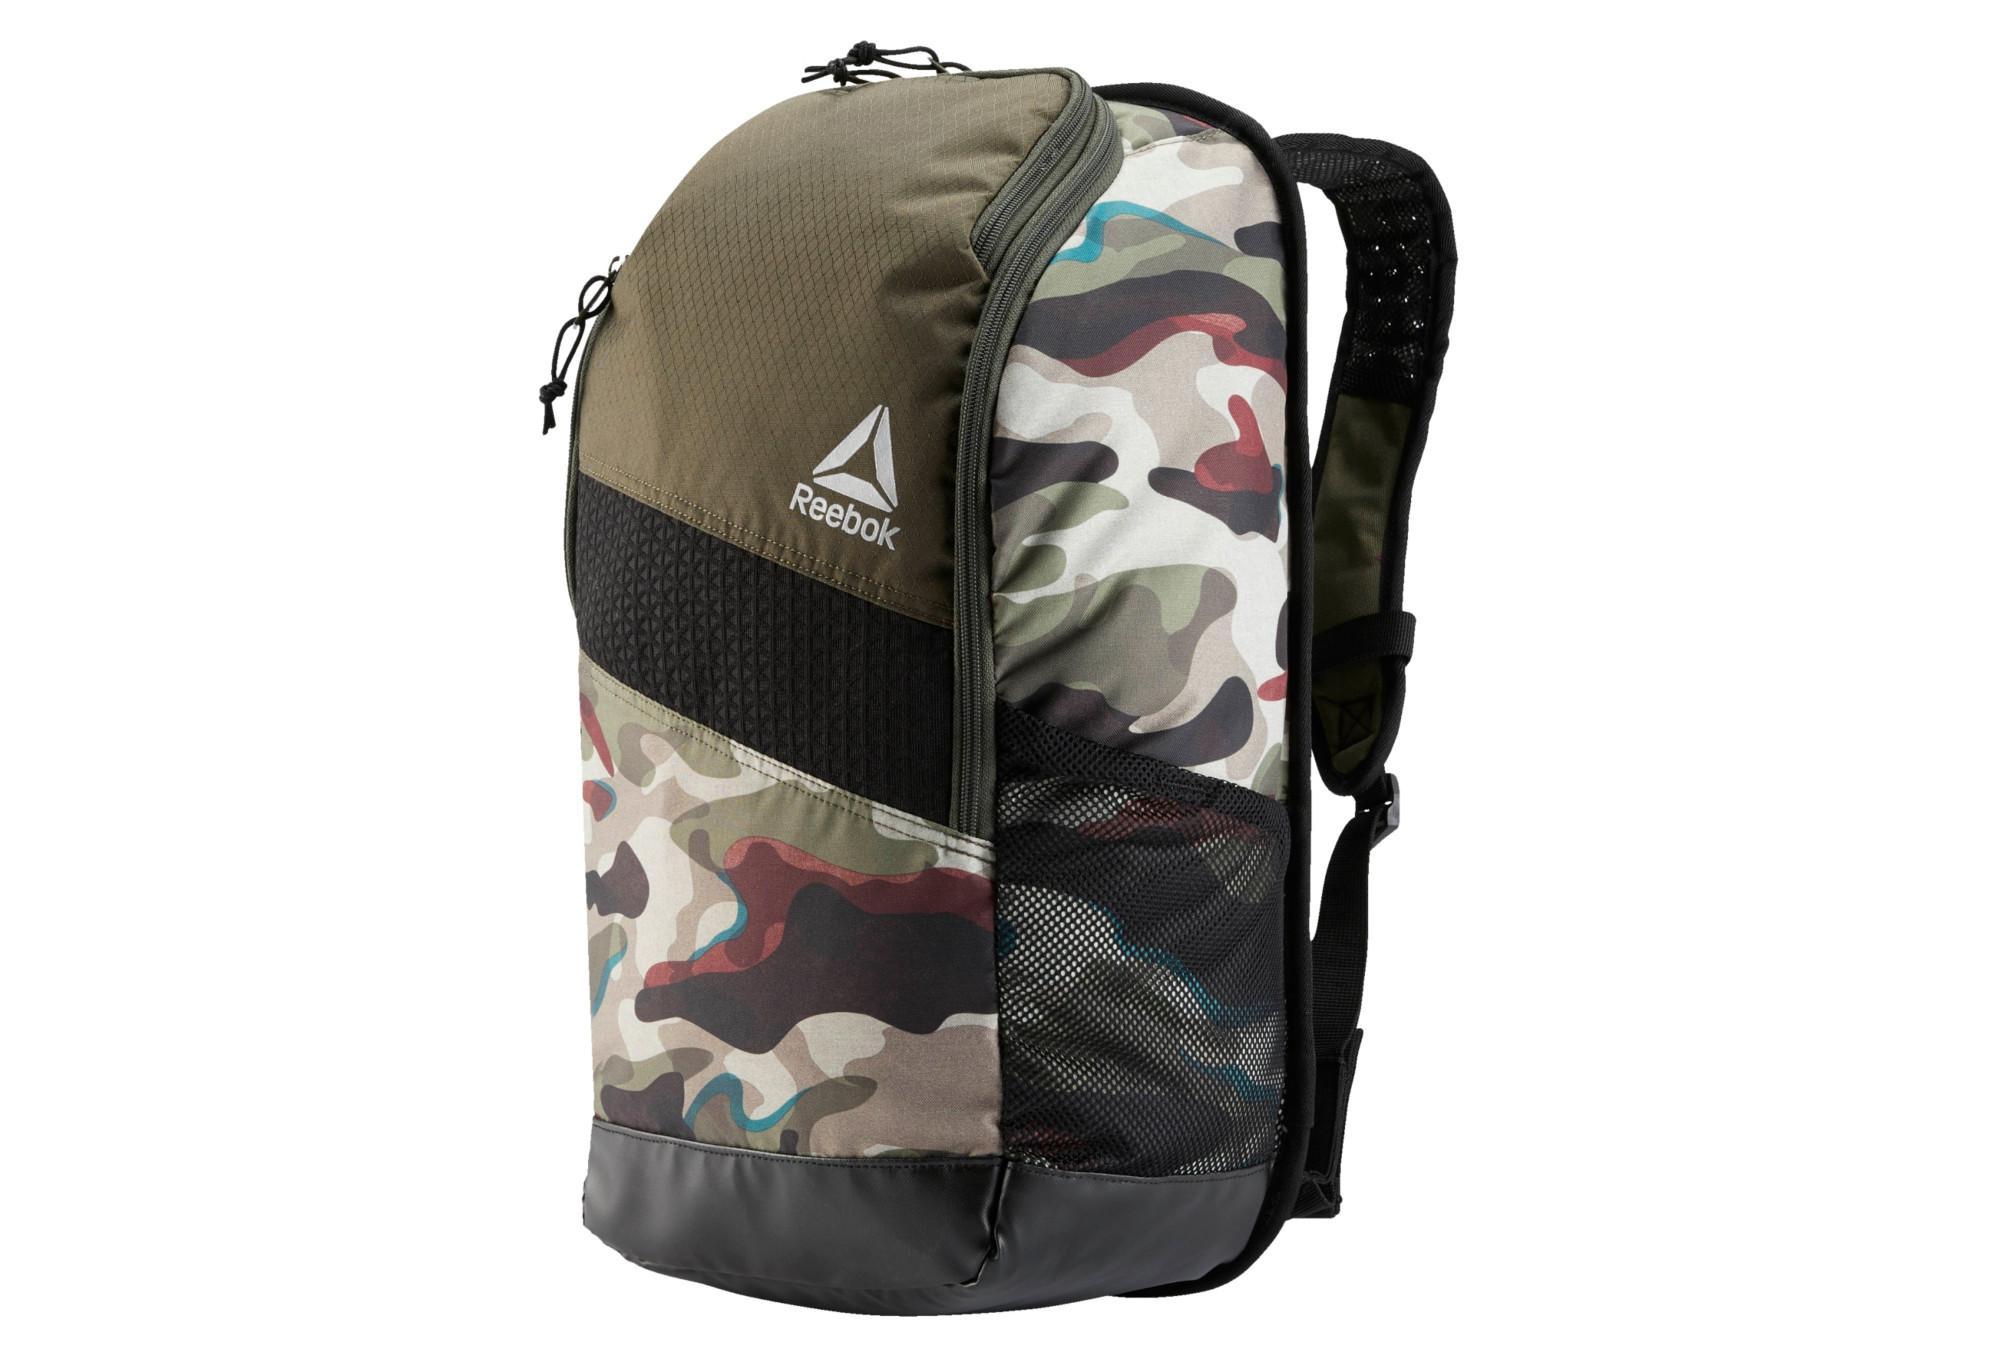 Reebok Backpack 24L Camo